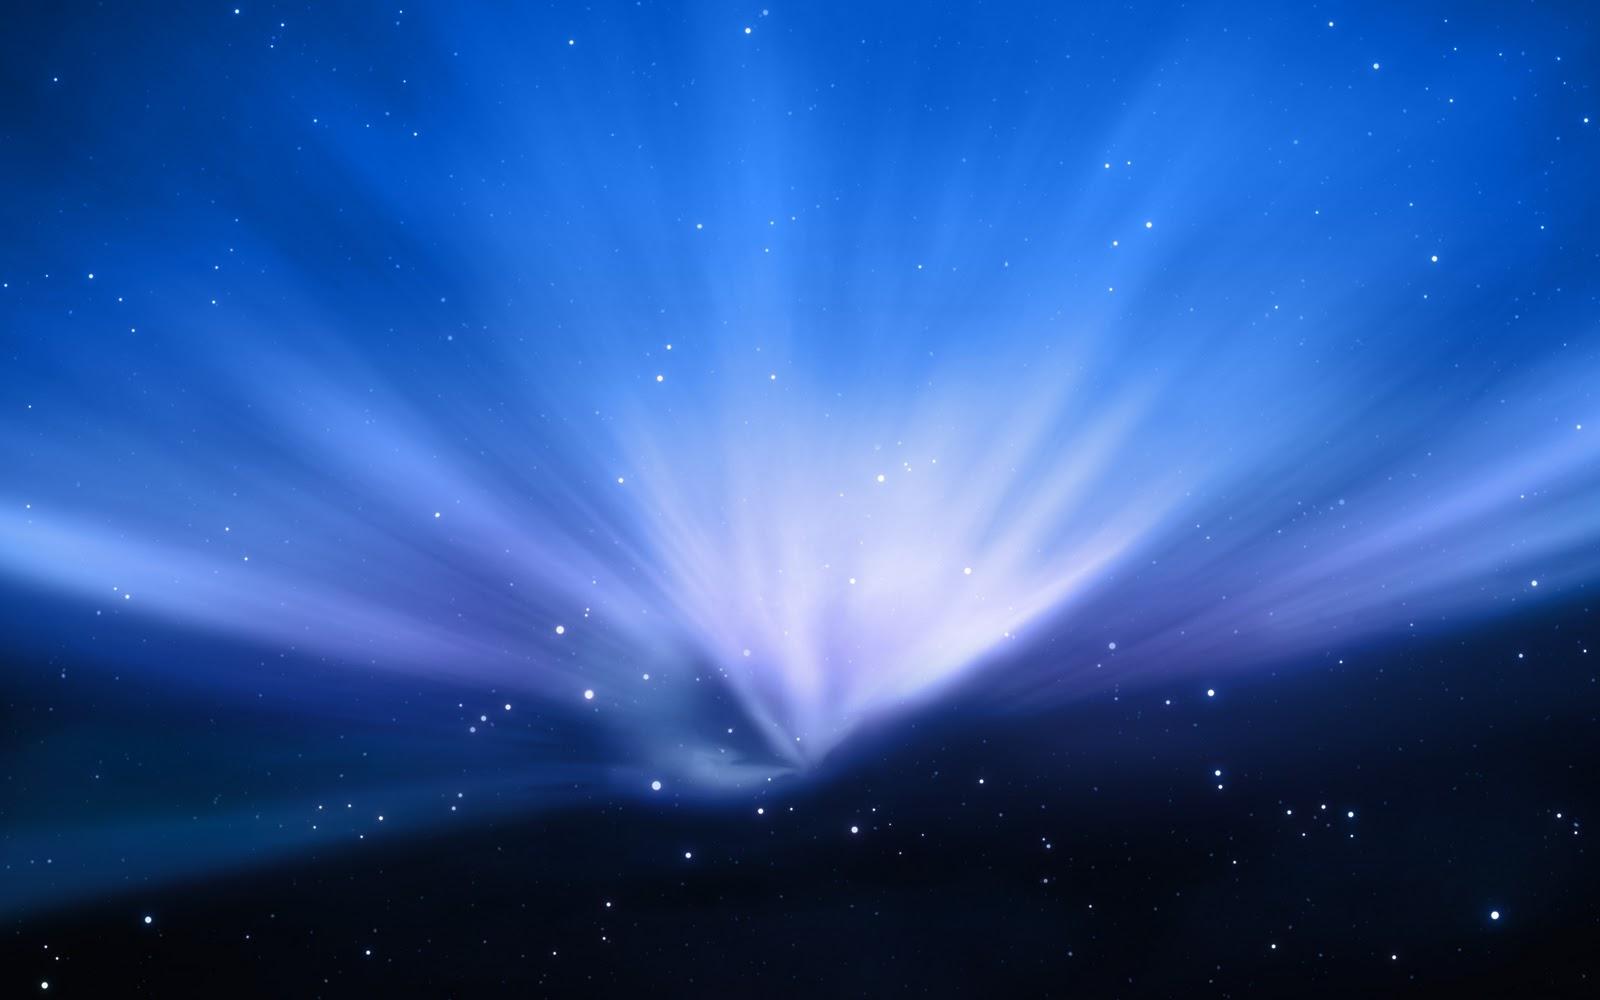 http://3.bp.blogspot.com/-PMXAjm_QB-I/TWdrtsJdIYI/AAAAAAAADbQ/Cg7JP6z2cdU/s1600/Blauwe-achtergronden-blauw-achtergrond-blauwe-wallpapers-hd-8.jpg